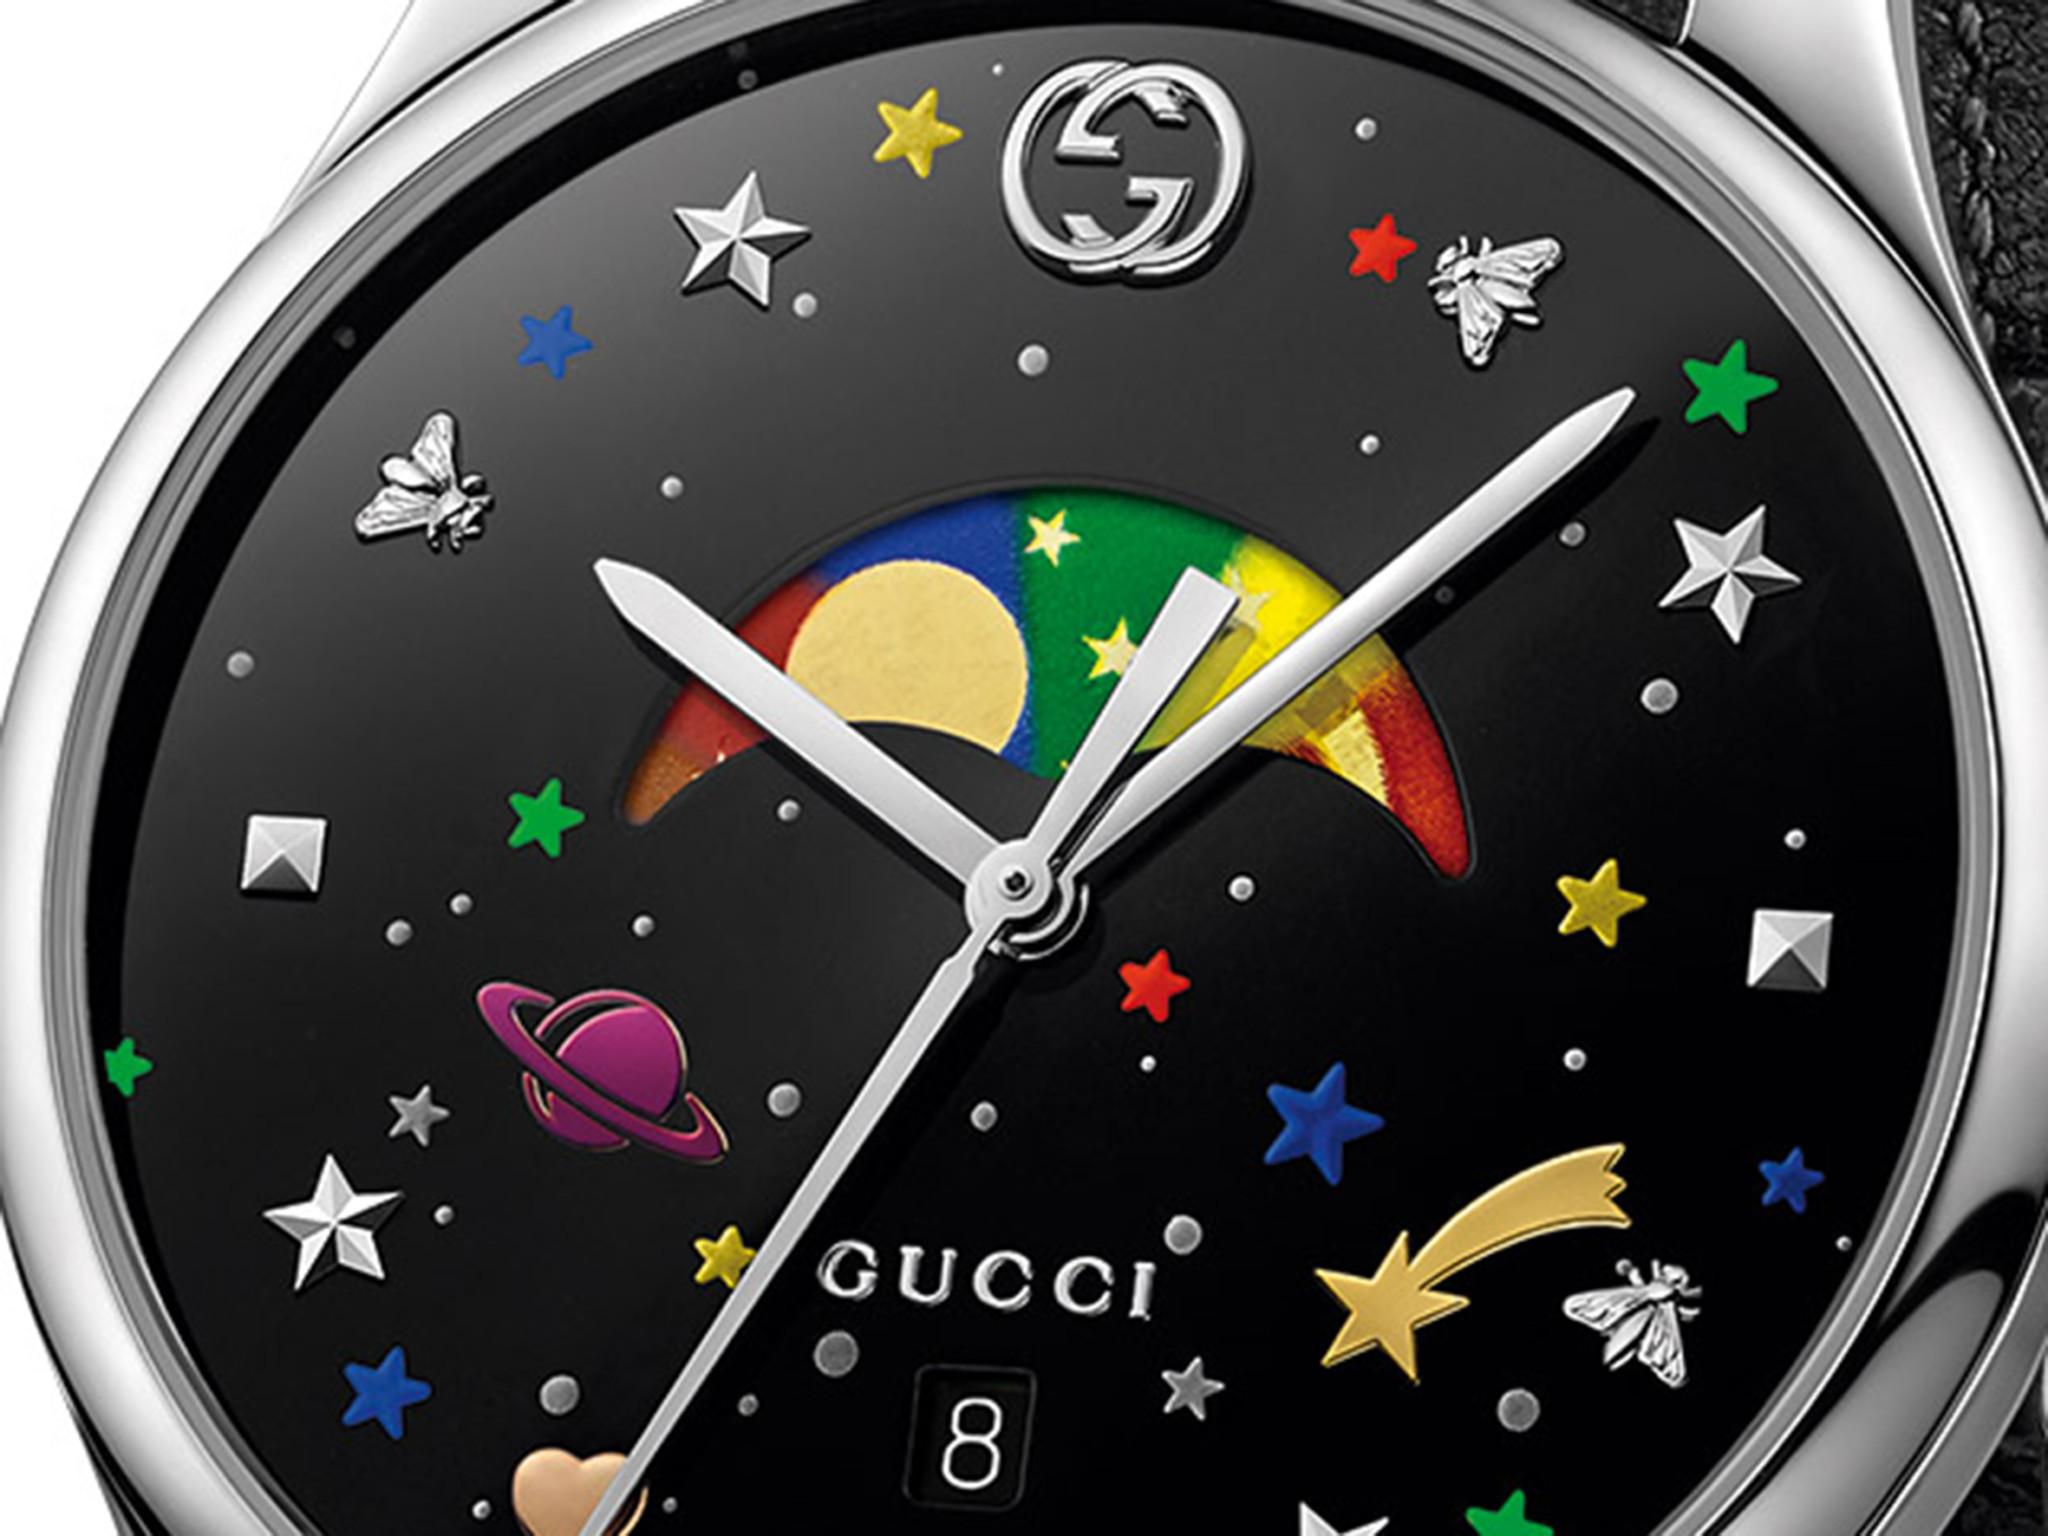 Gucci Timeless closeup